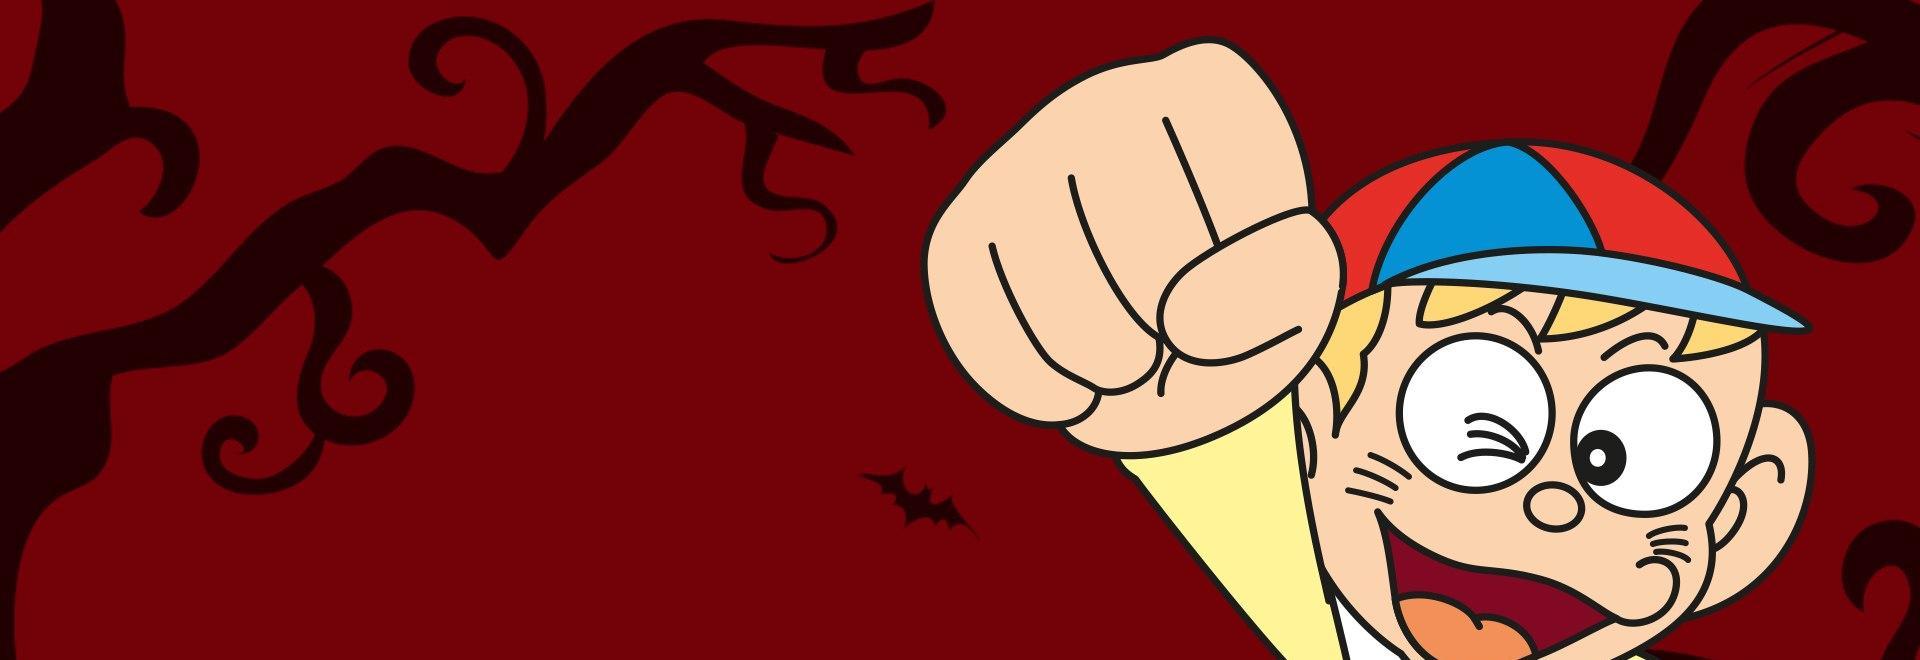 Black Bat l'incapace / Il fantasma Poltergeist